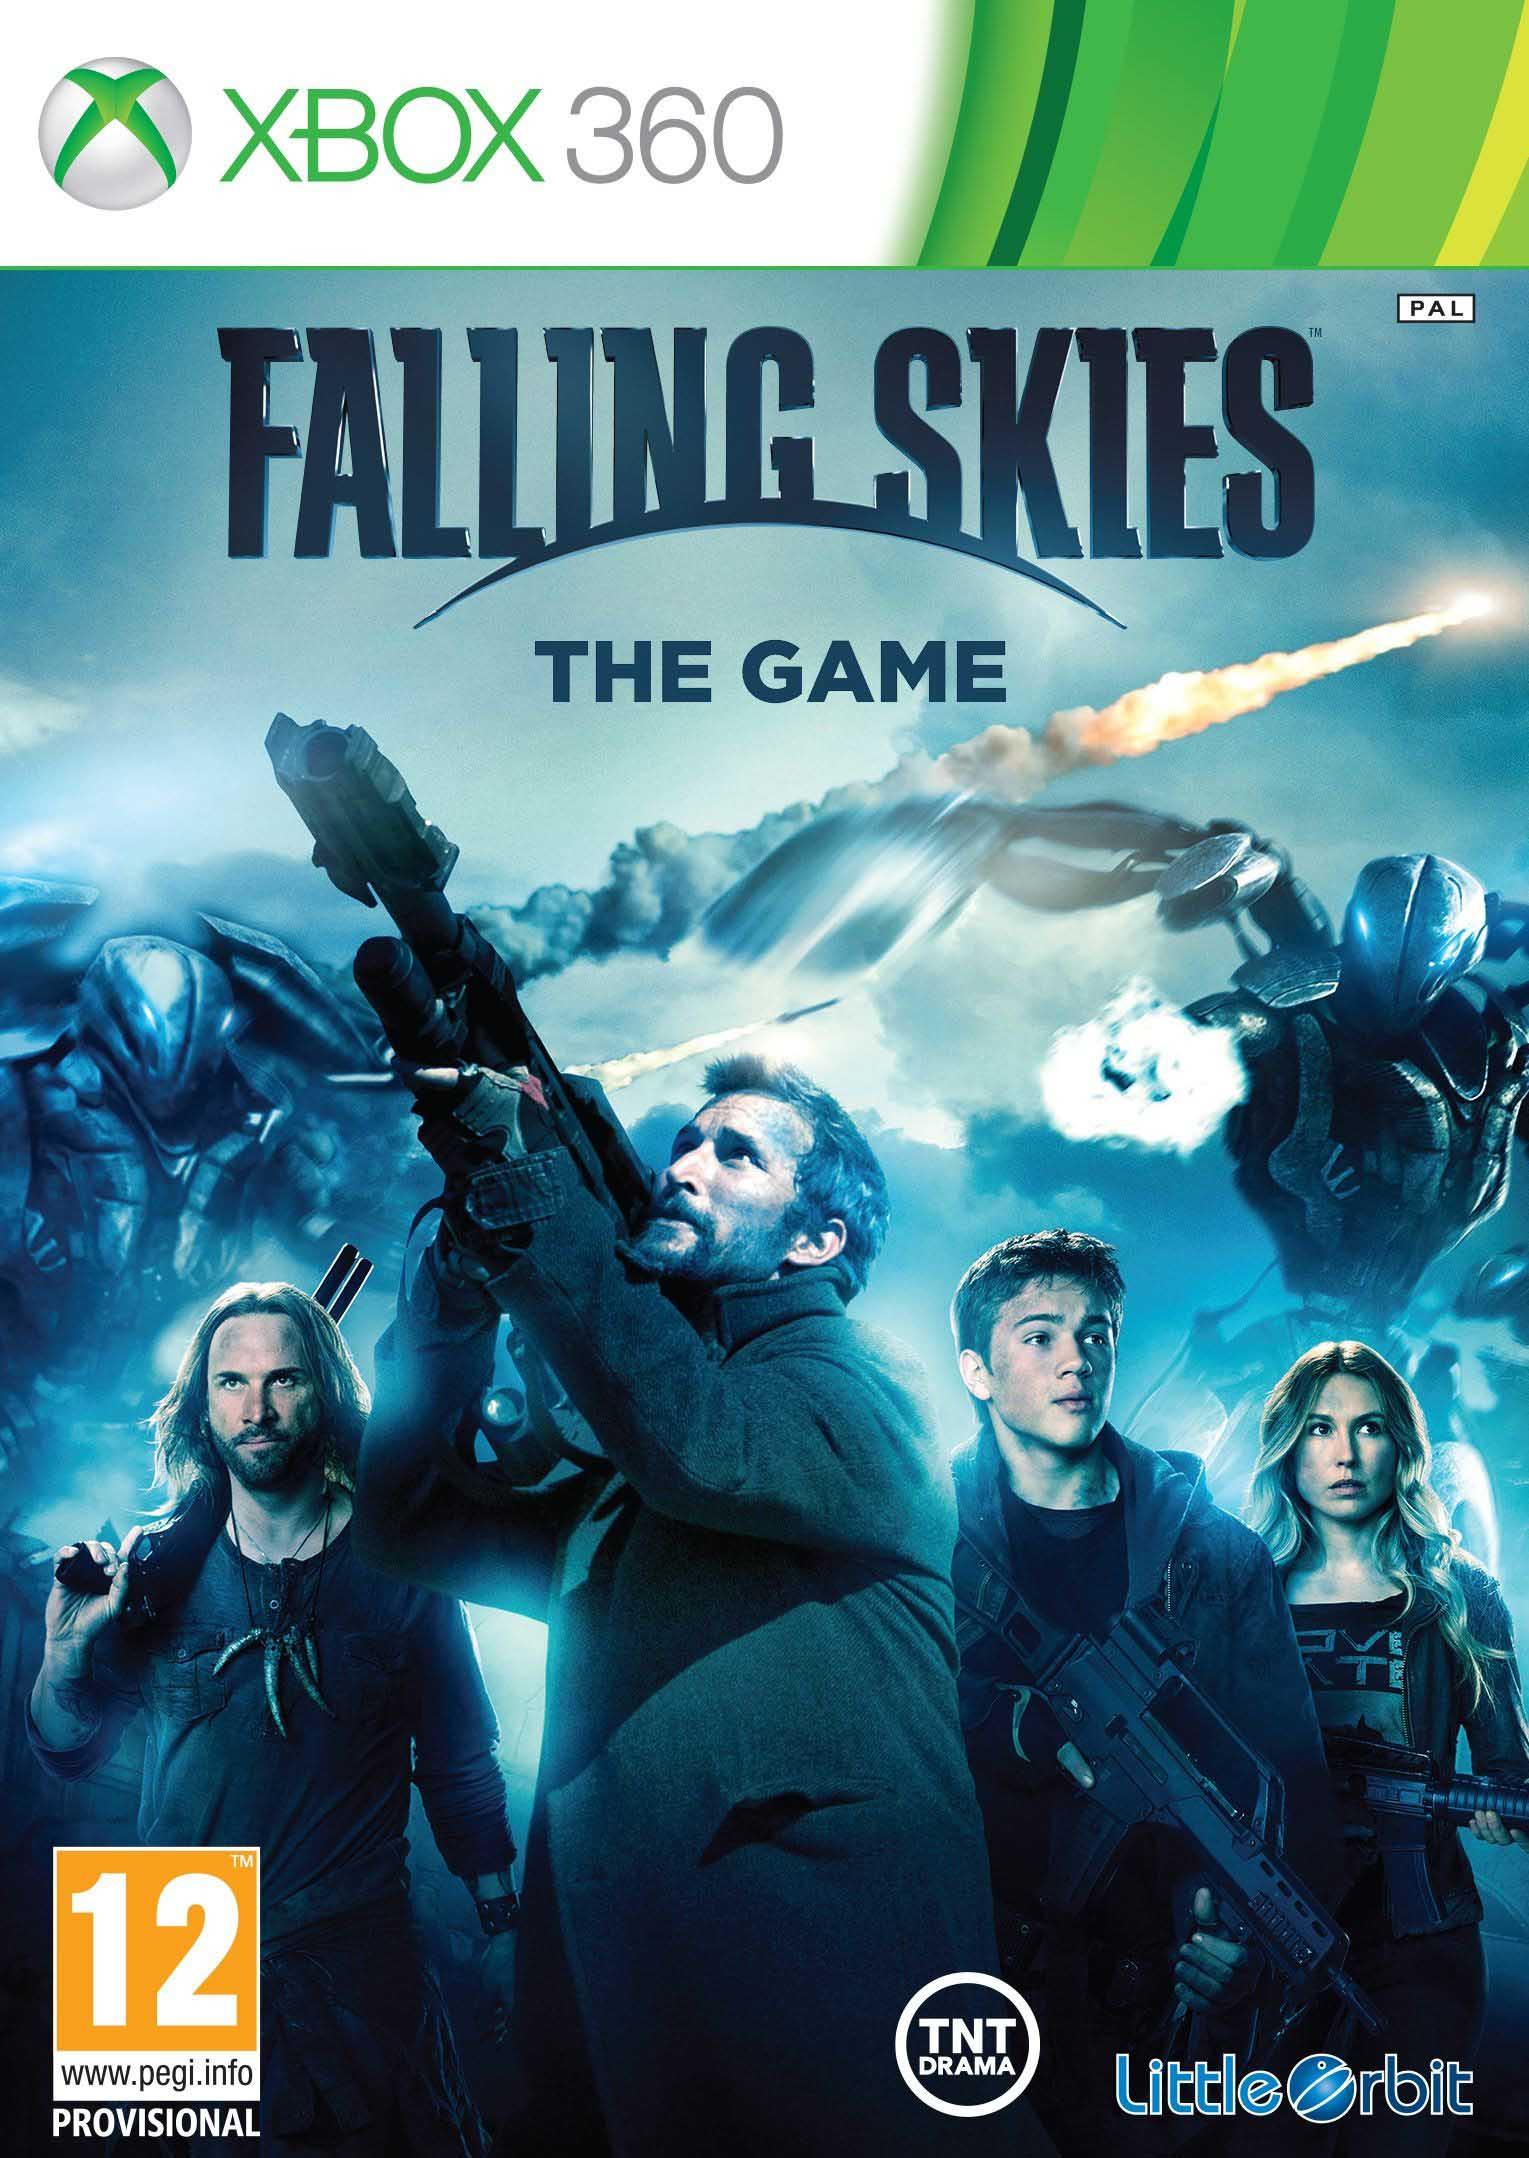 FALLING SKIES The Game - X360